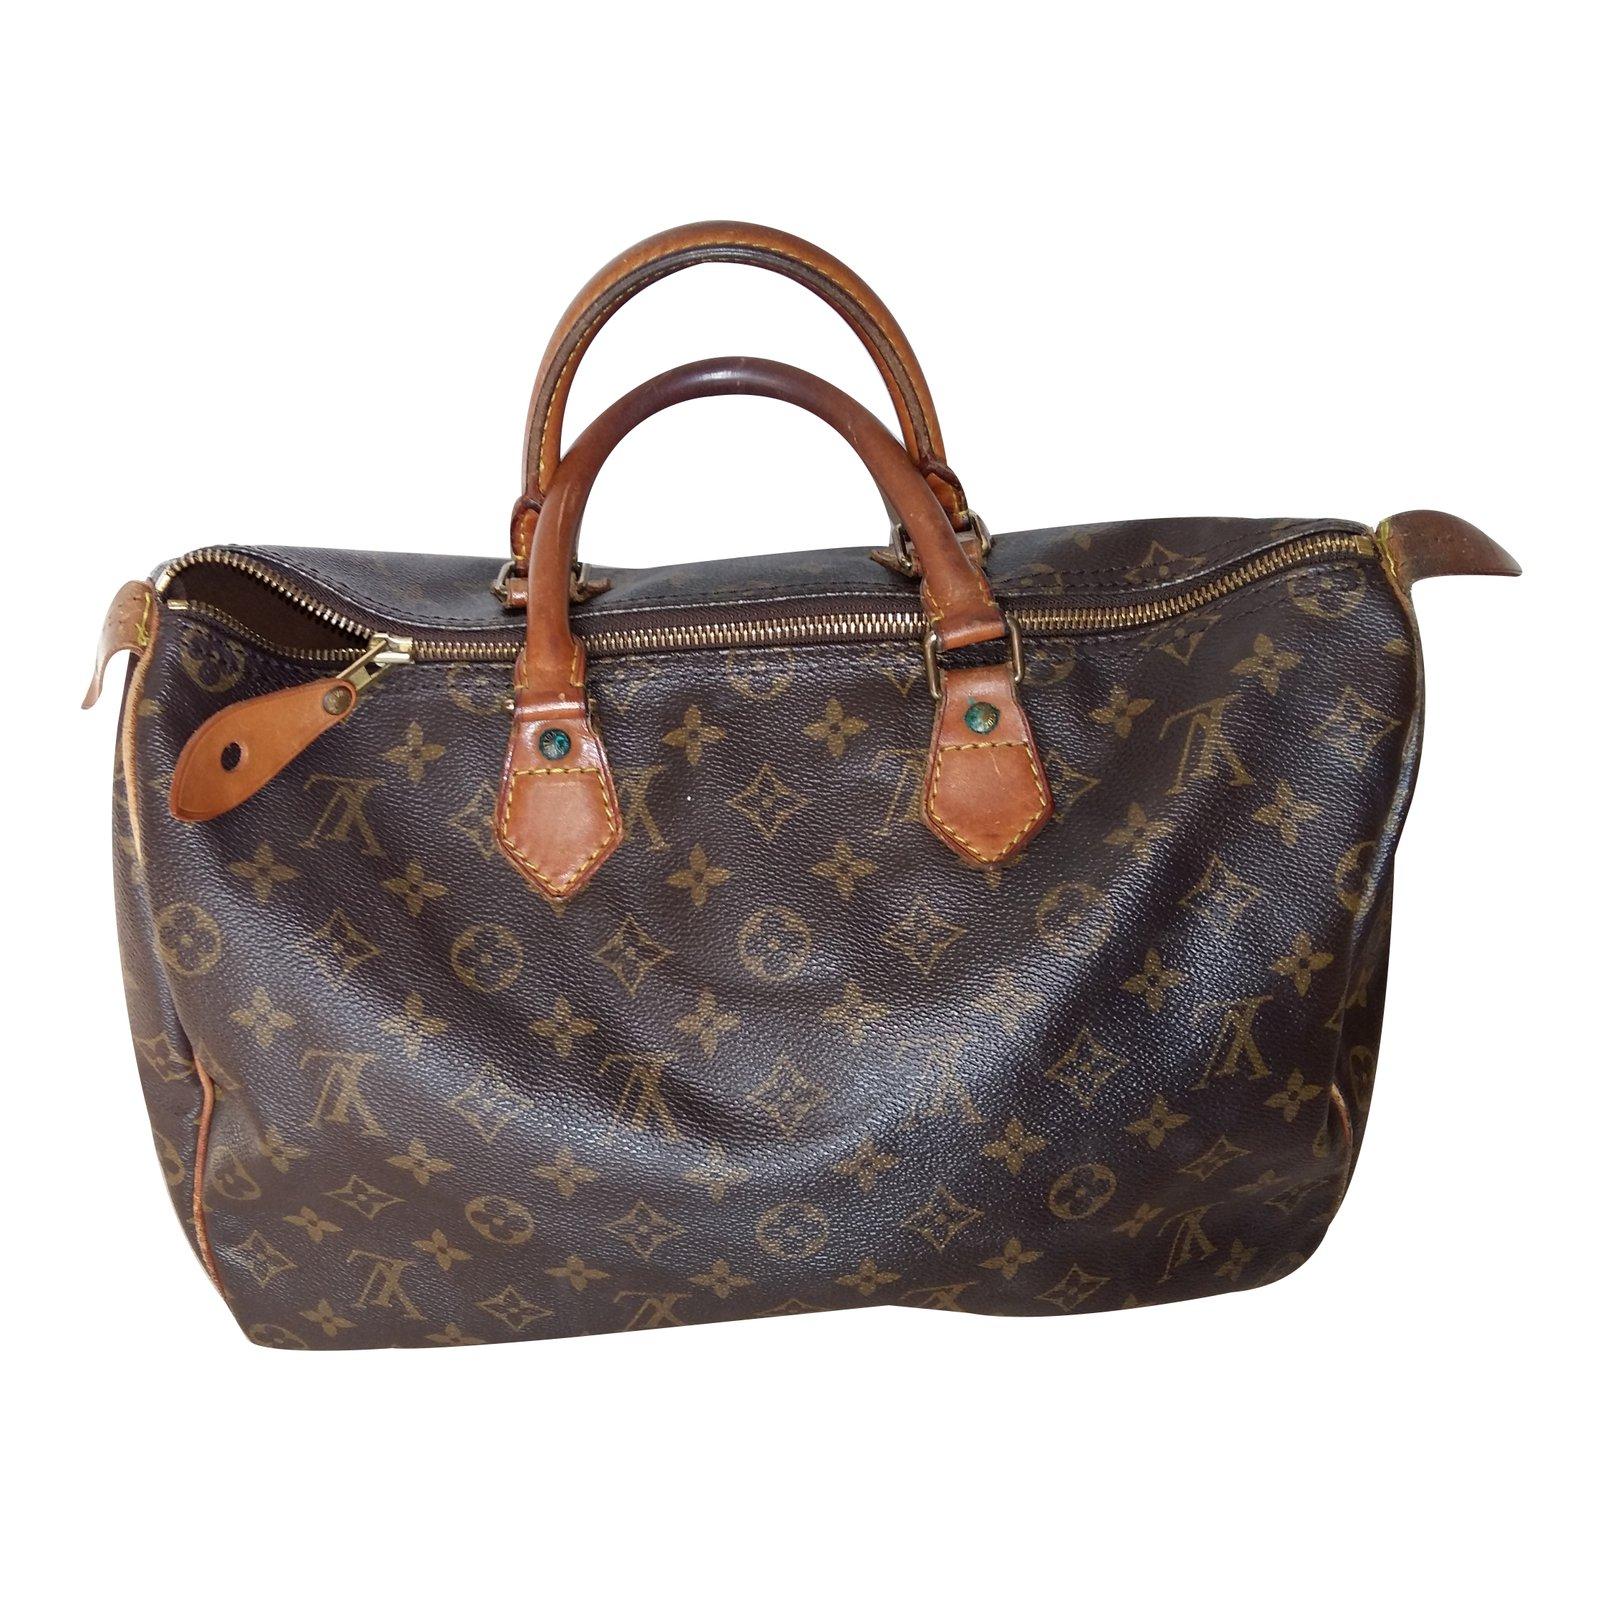 257fed1e47c2 Sacs à main Louis Vuitton Speedy 35 Toile Marron ref.32309 - Joli Closet